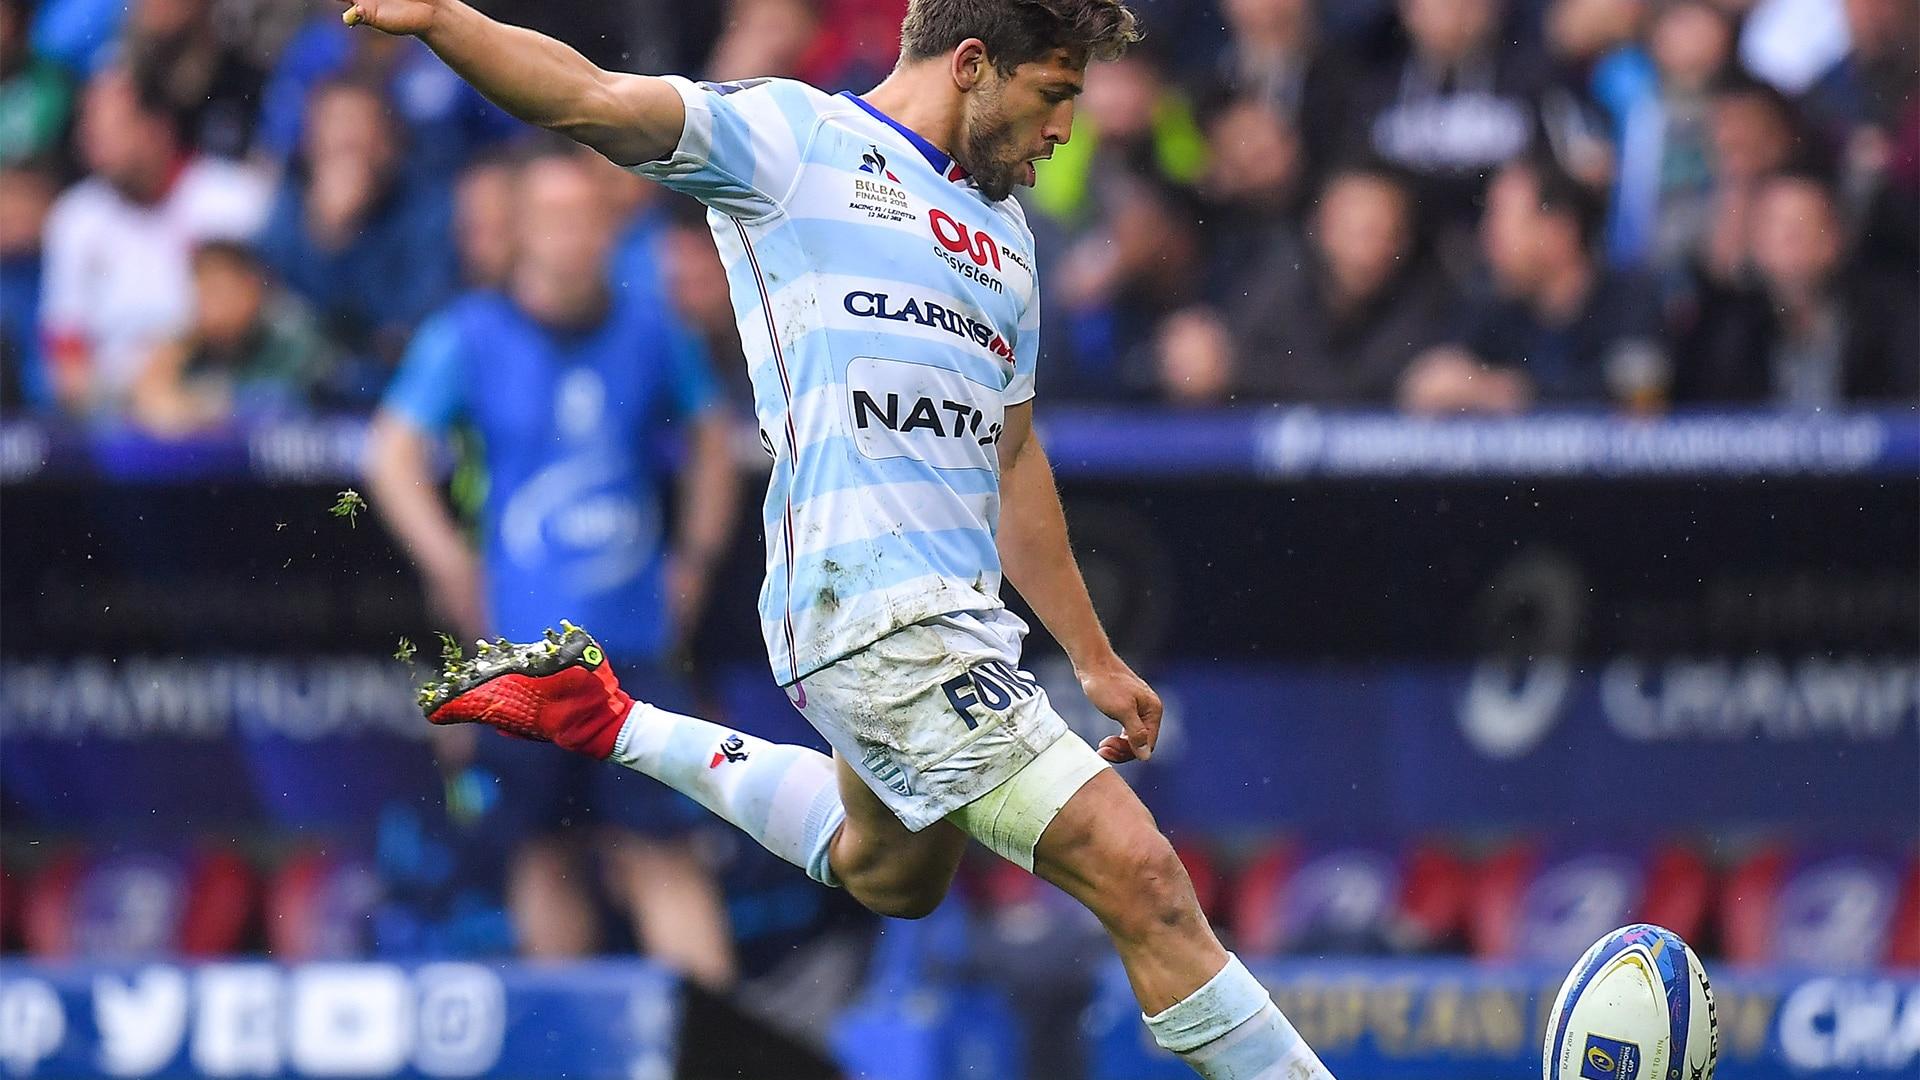 Man kicks rugby ball